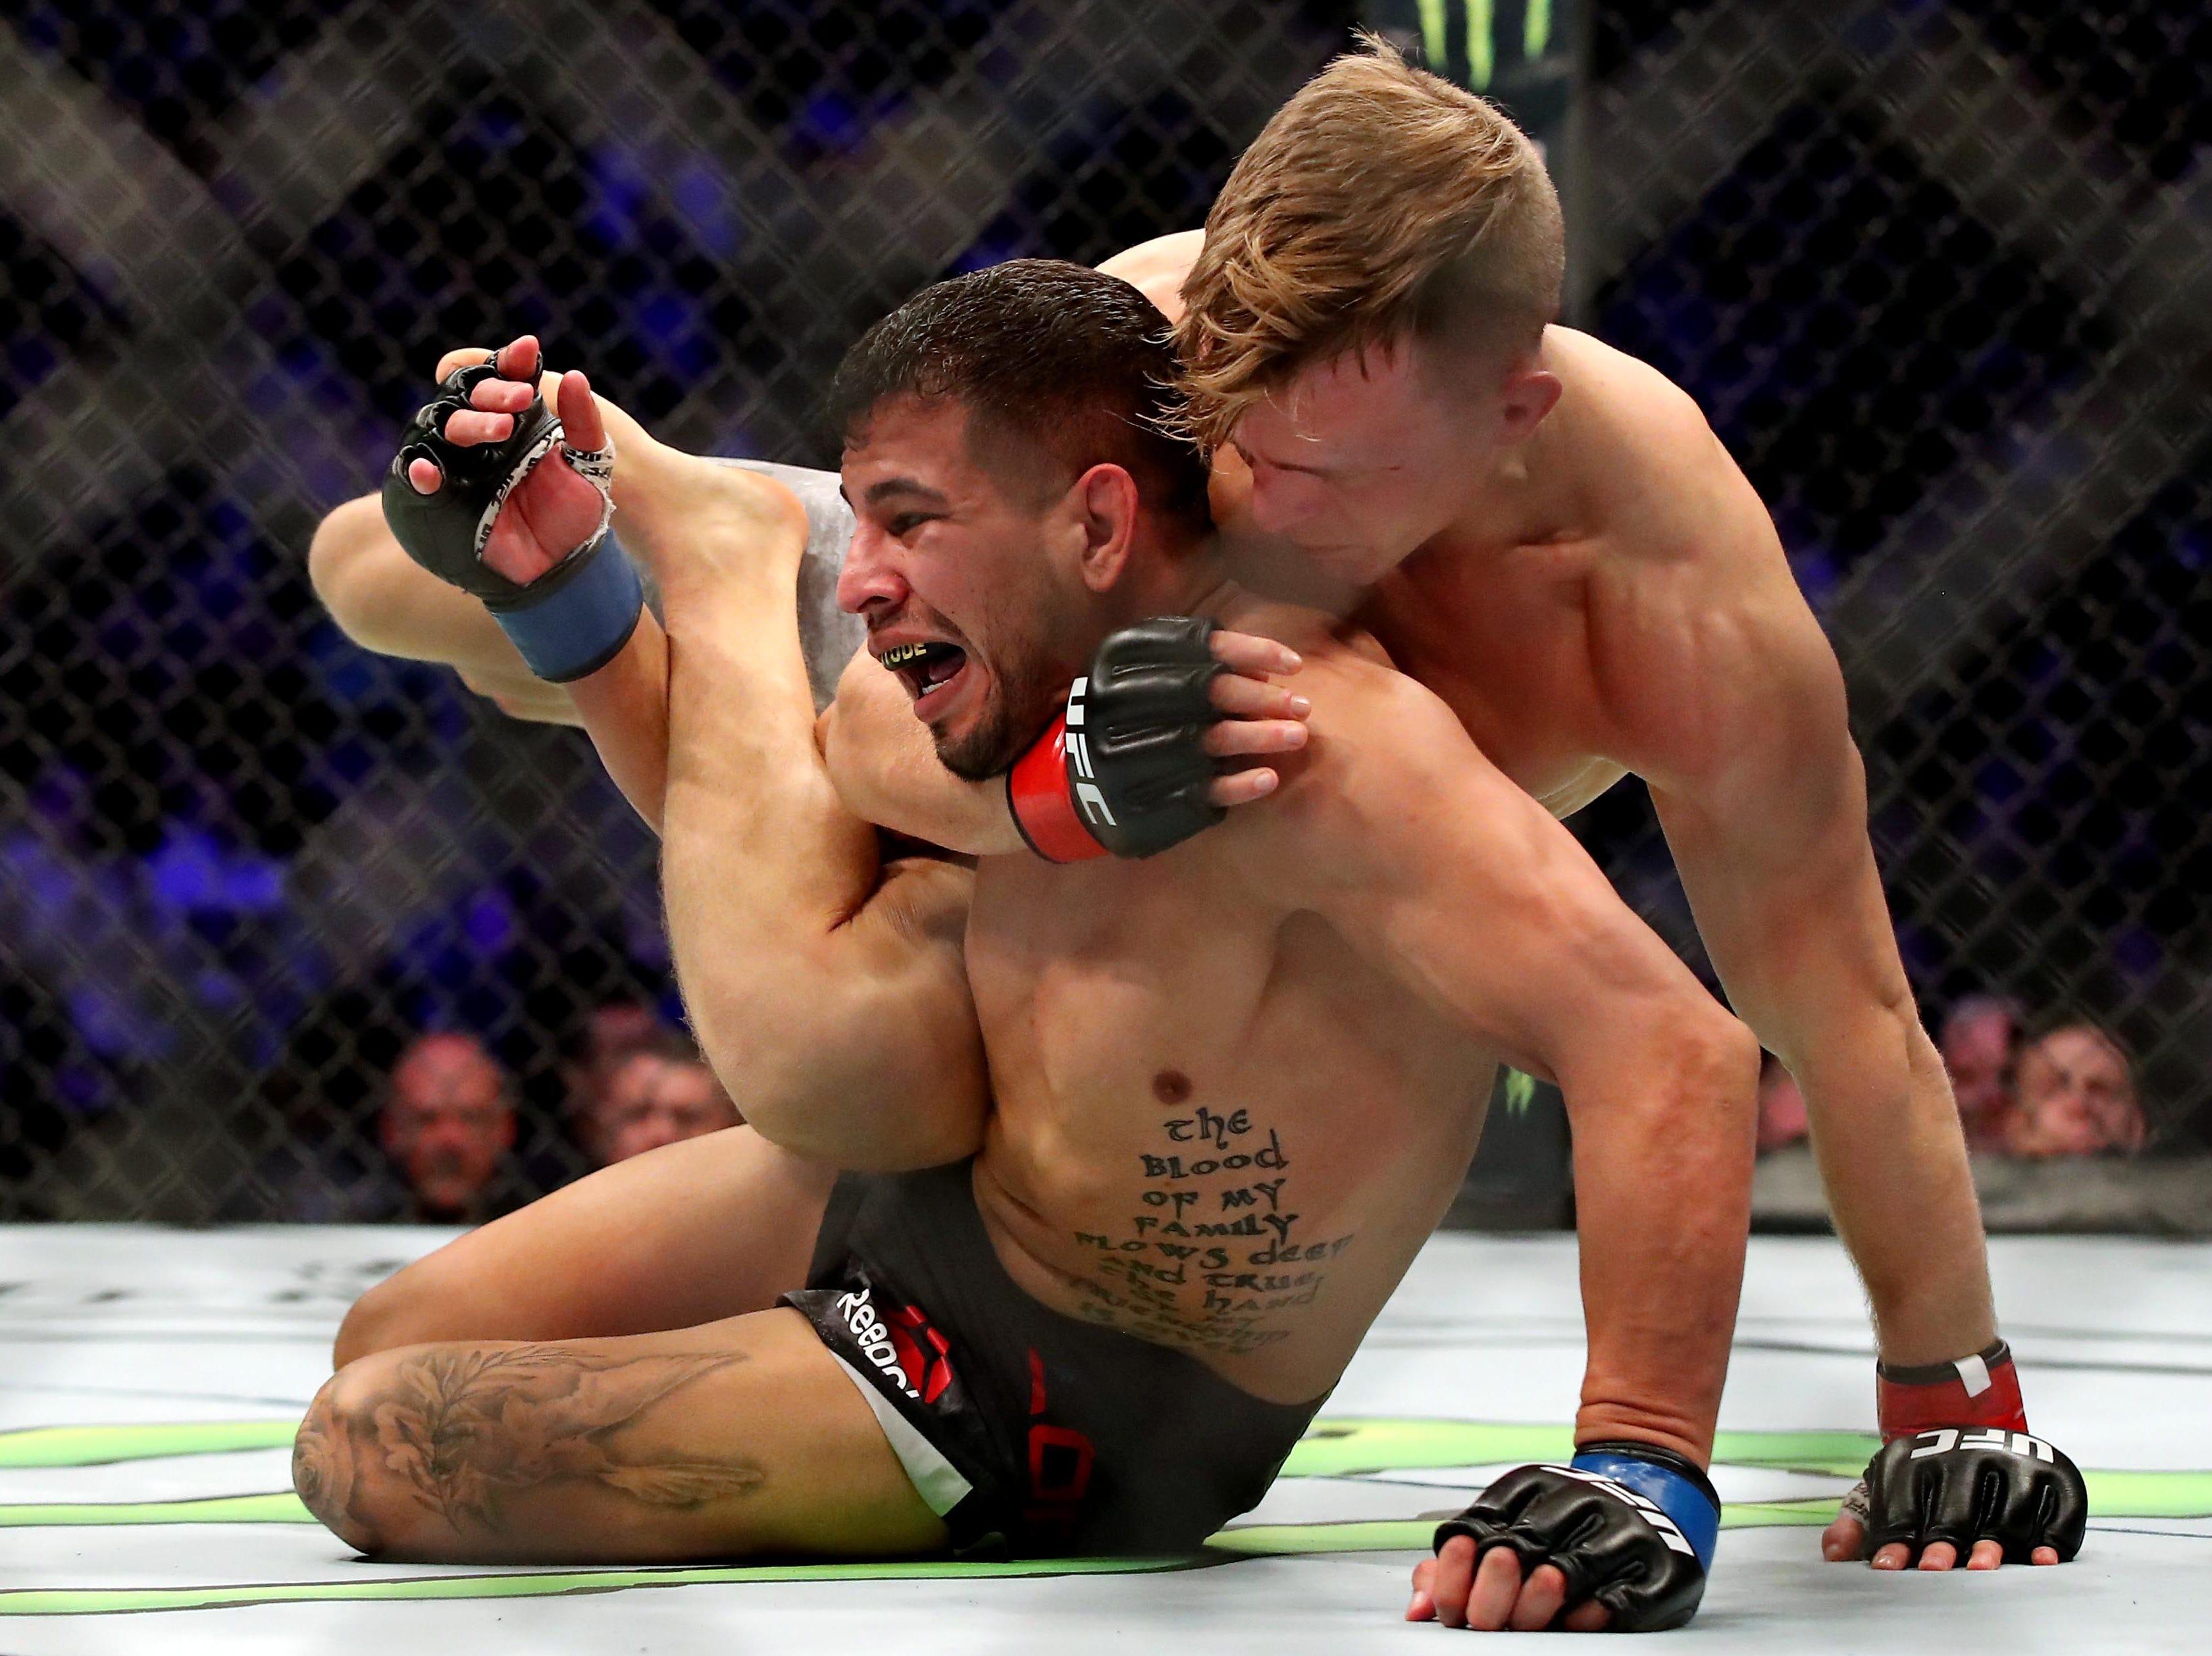 Brad Katona (red gloves) fights Matthew Lopez (blue gloves) during UFC 231 at Scotiabank Arena.